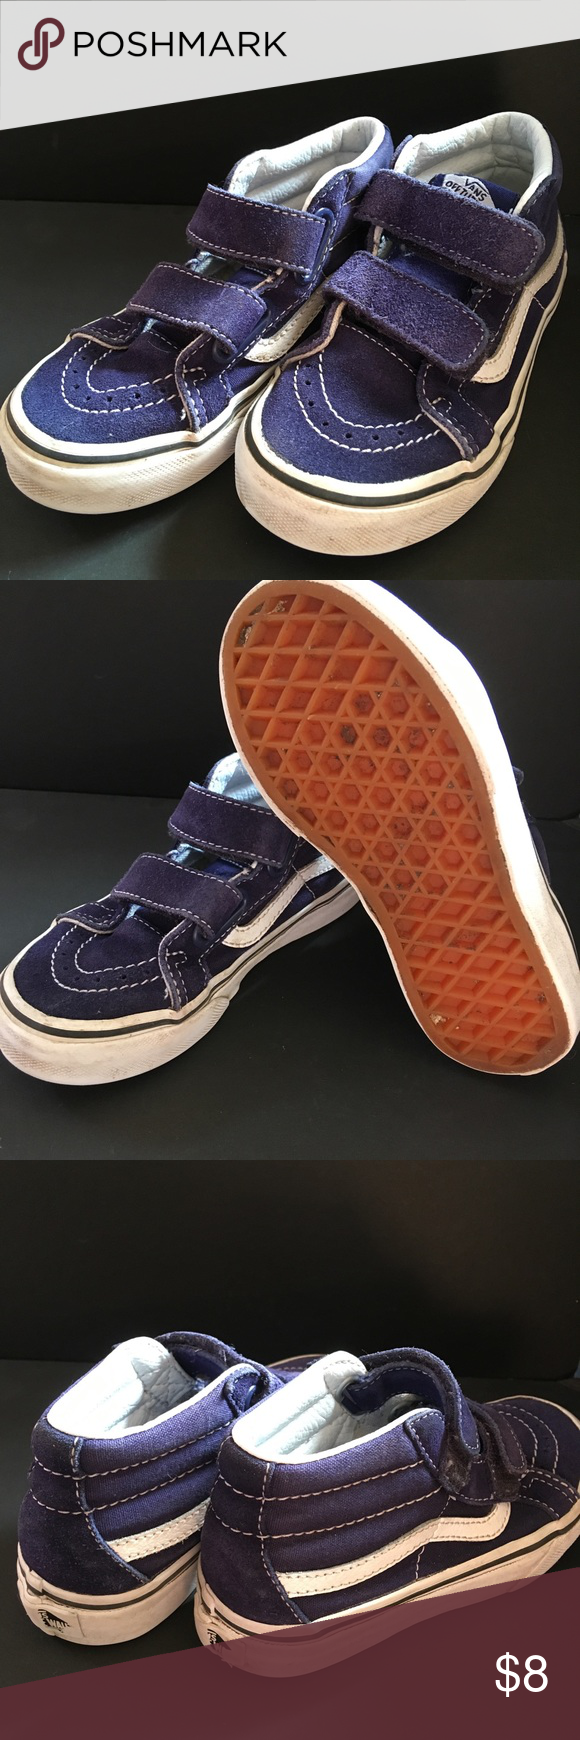 04d6b66d62 Vans Off-the-Wall Hi-top skate sneaker. VANS Off the Wall